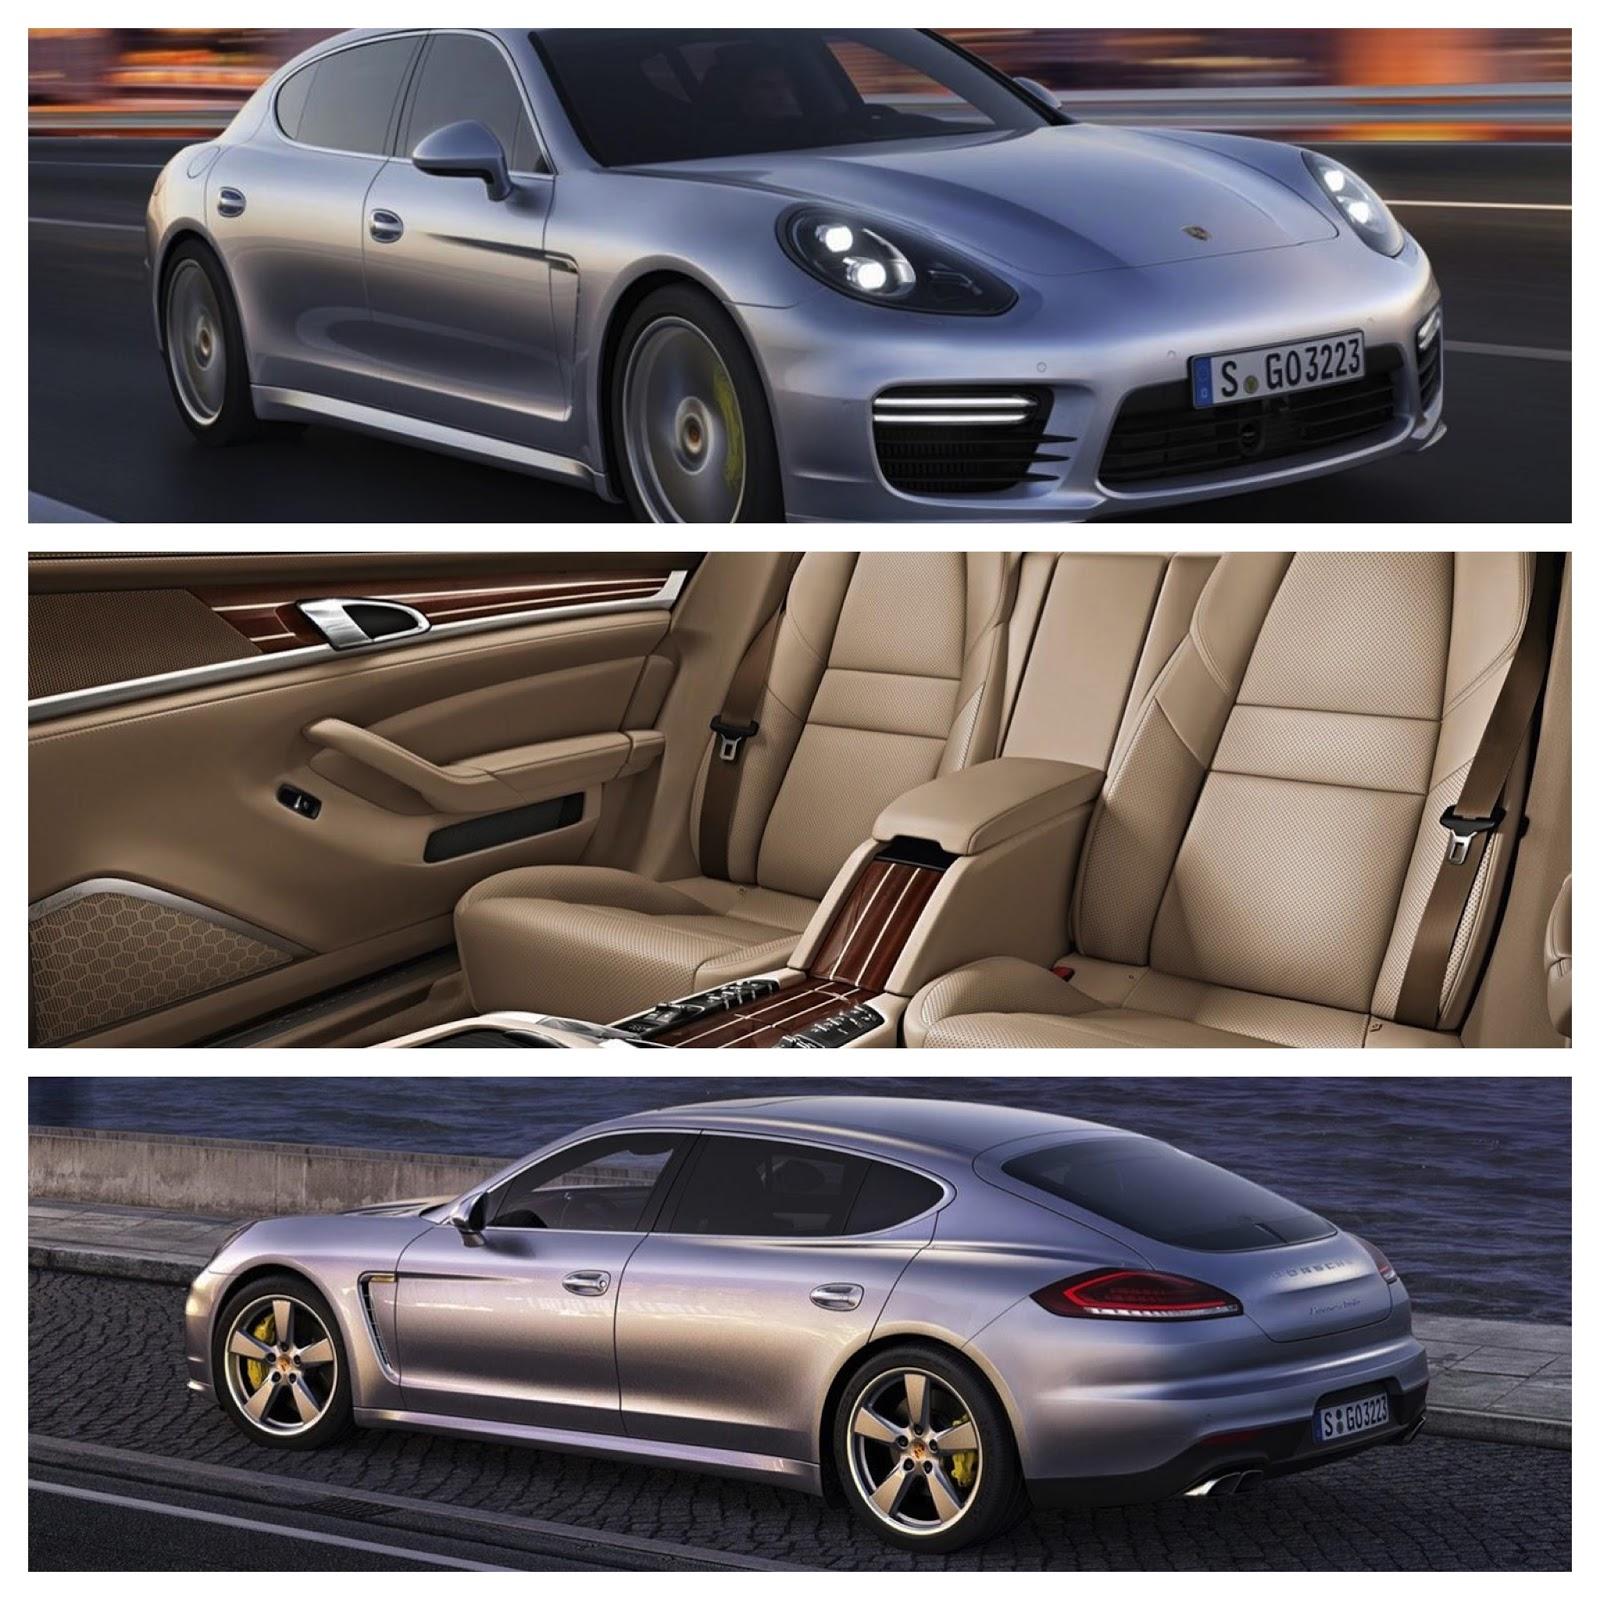 Porsche Panamera Car: 2014 Porsche Panamera Facelift Photos Were Leaked!